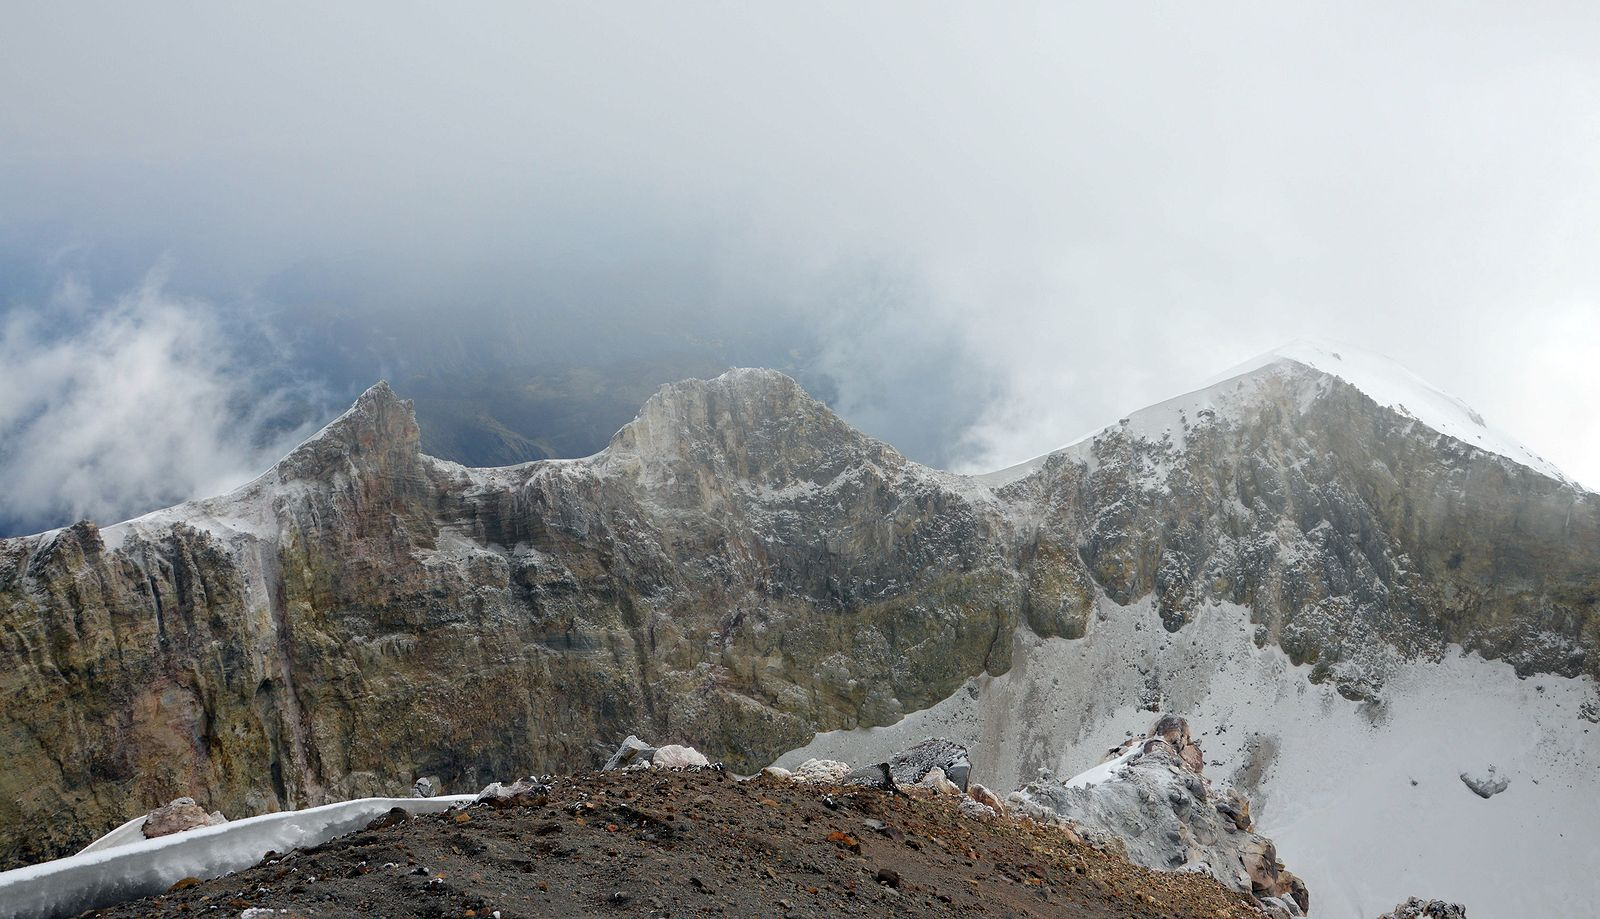 Z výstupu na Pico de Orizaba 5640 m (Foto Jana Bežovská)